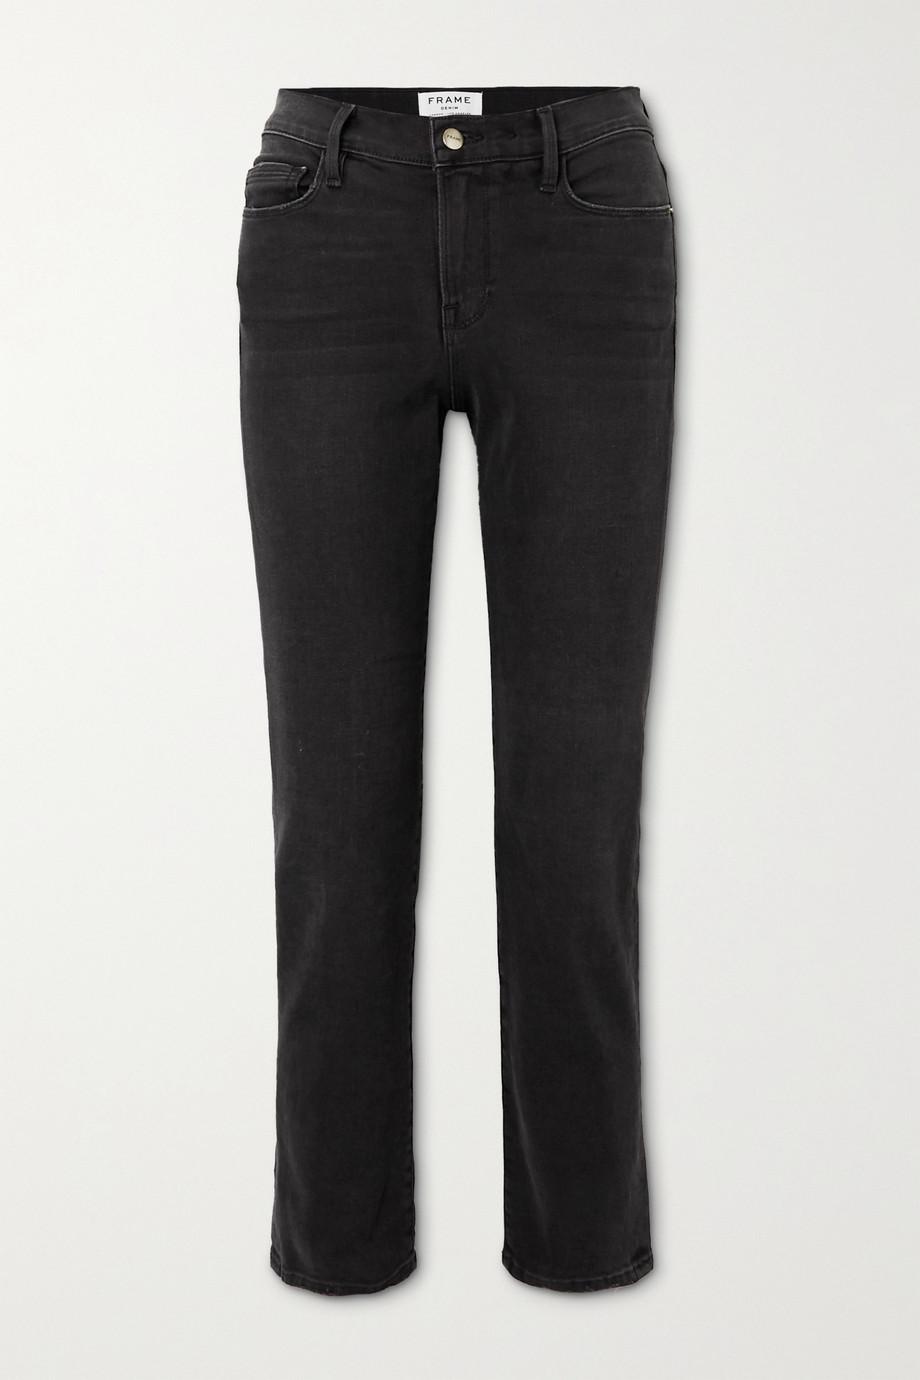 FRAME Le Nouveau cropped high-rise straight-leg jeans